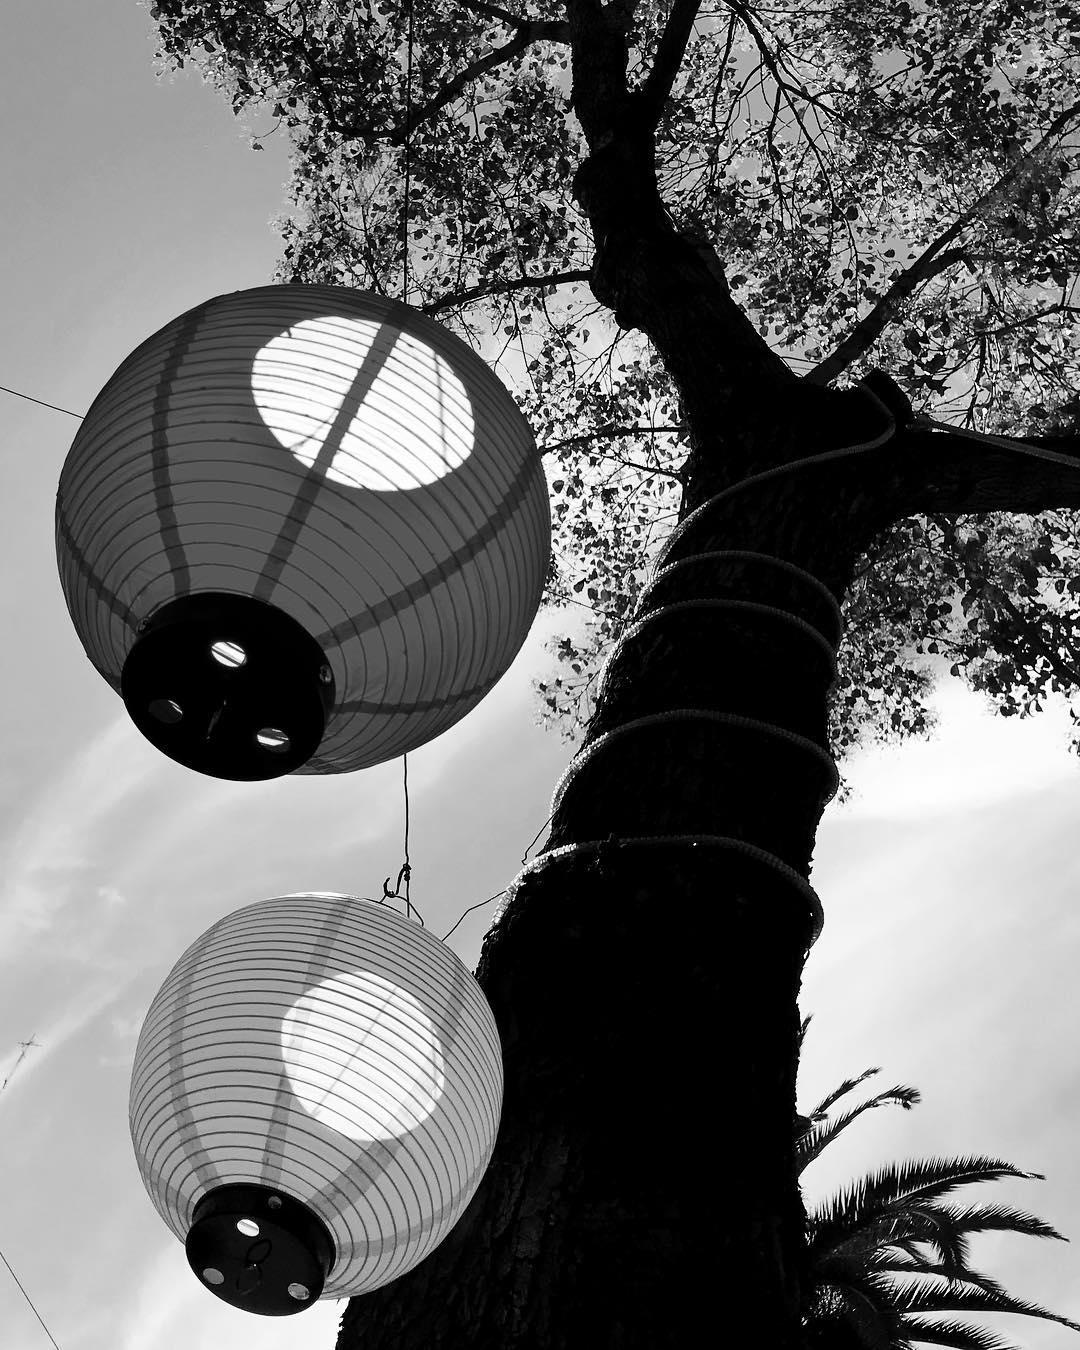 Festival de la Luna . . . . #ChinaTown #bnw #blackandwhite #ba #blackandwhitephotography #barriochinord